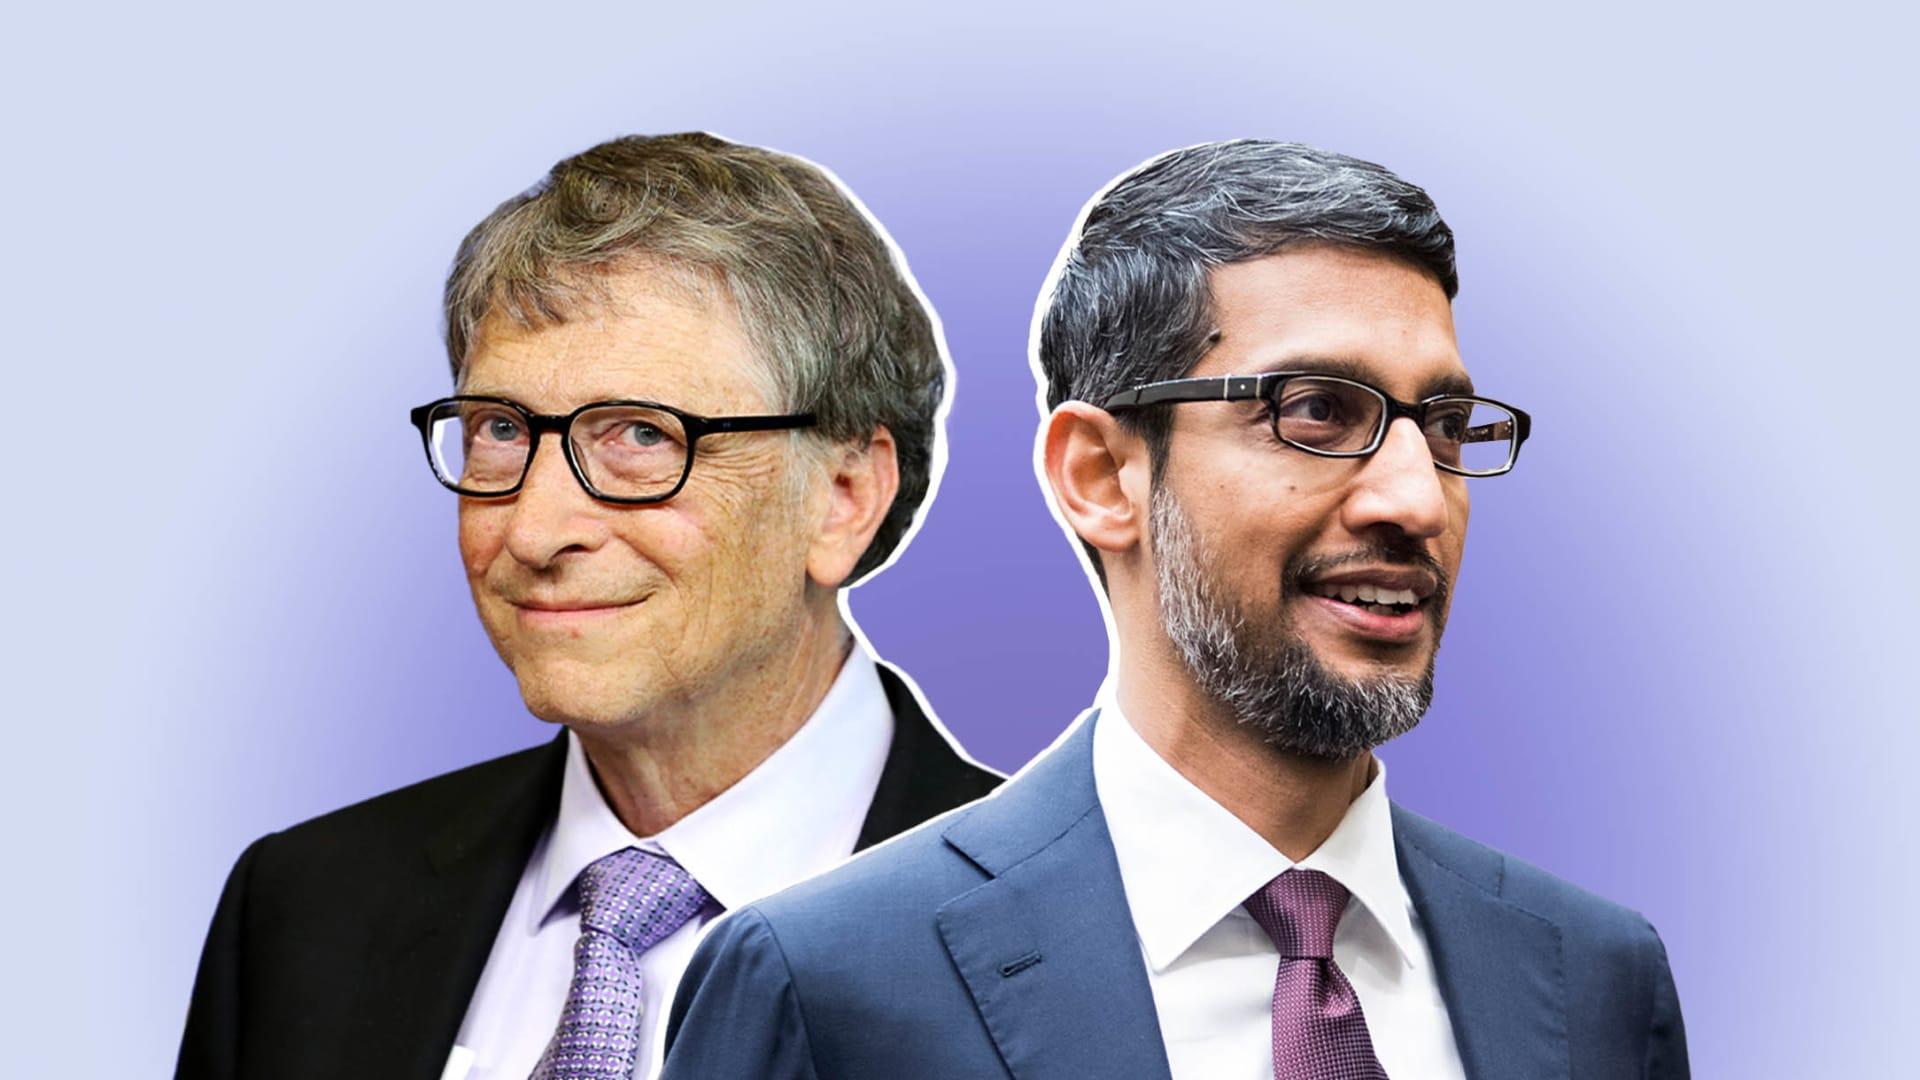 Bill Gates and Sundar Pichai.